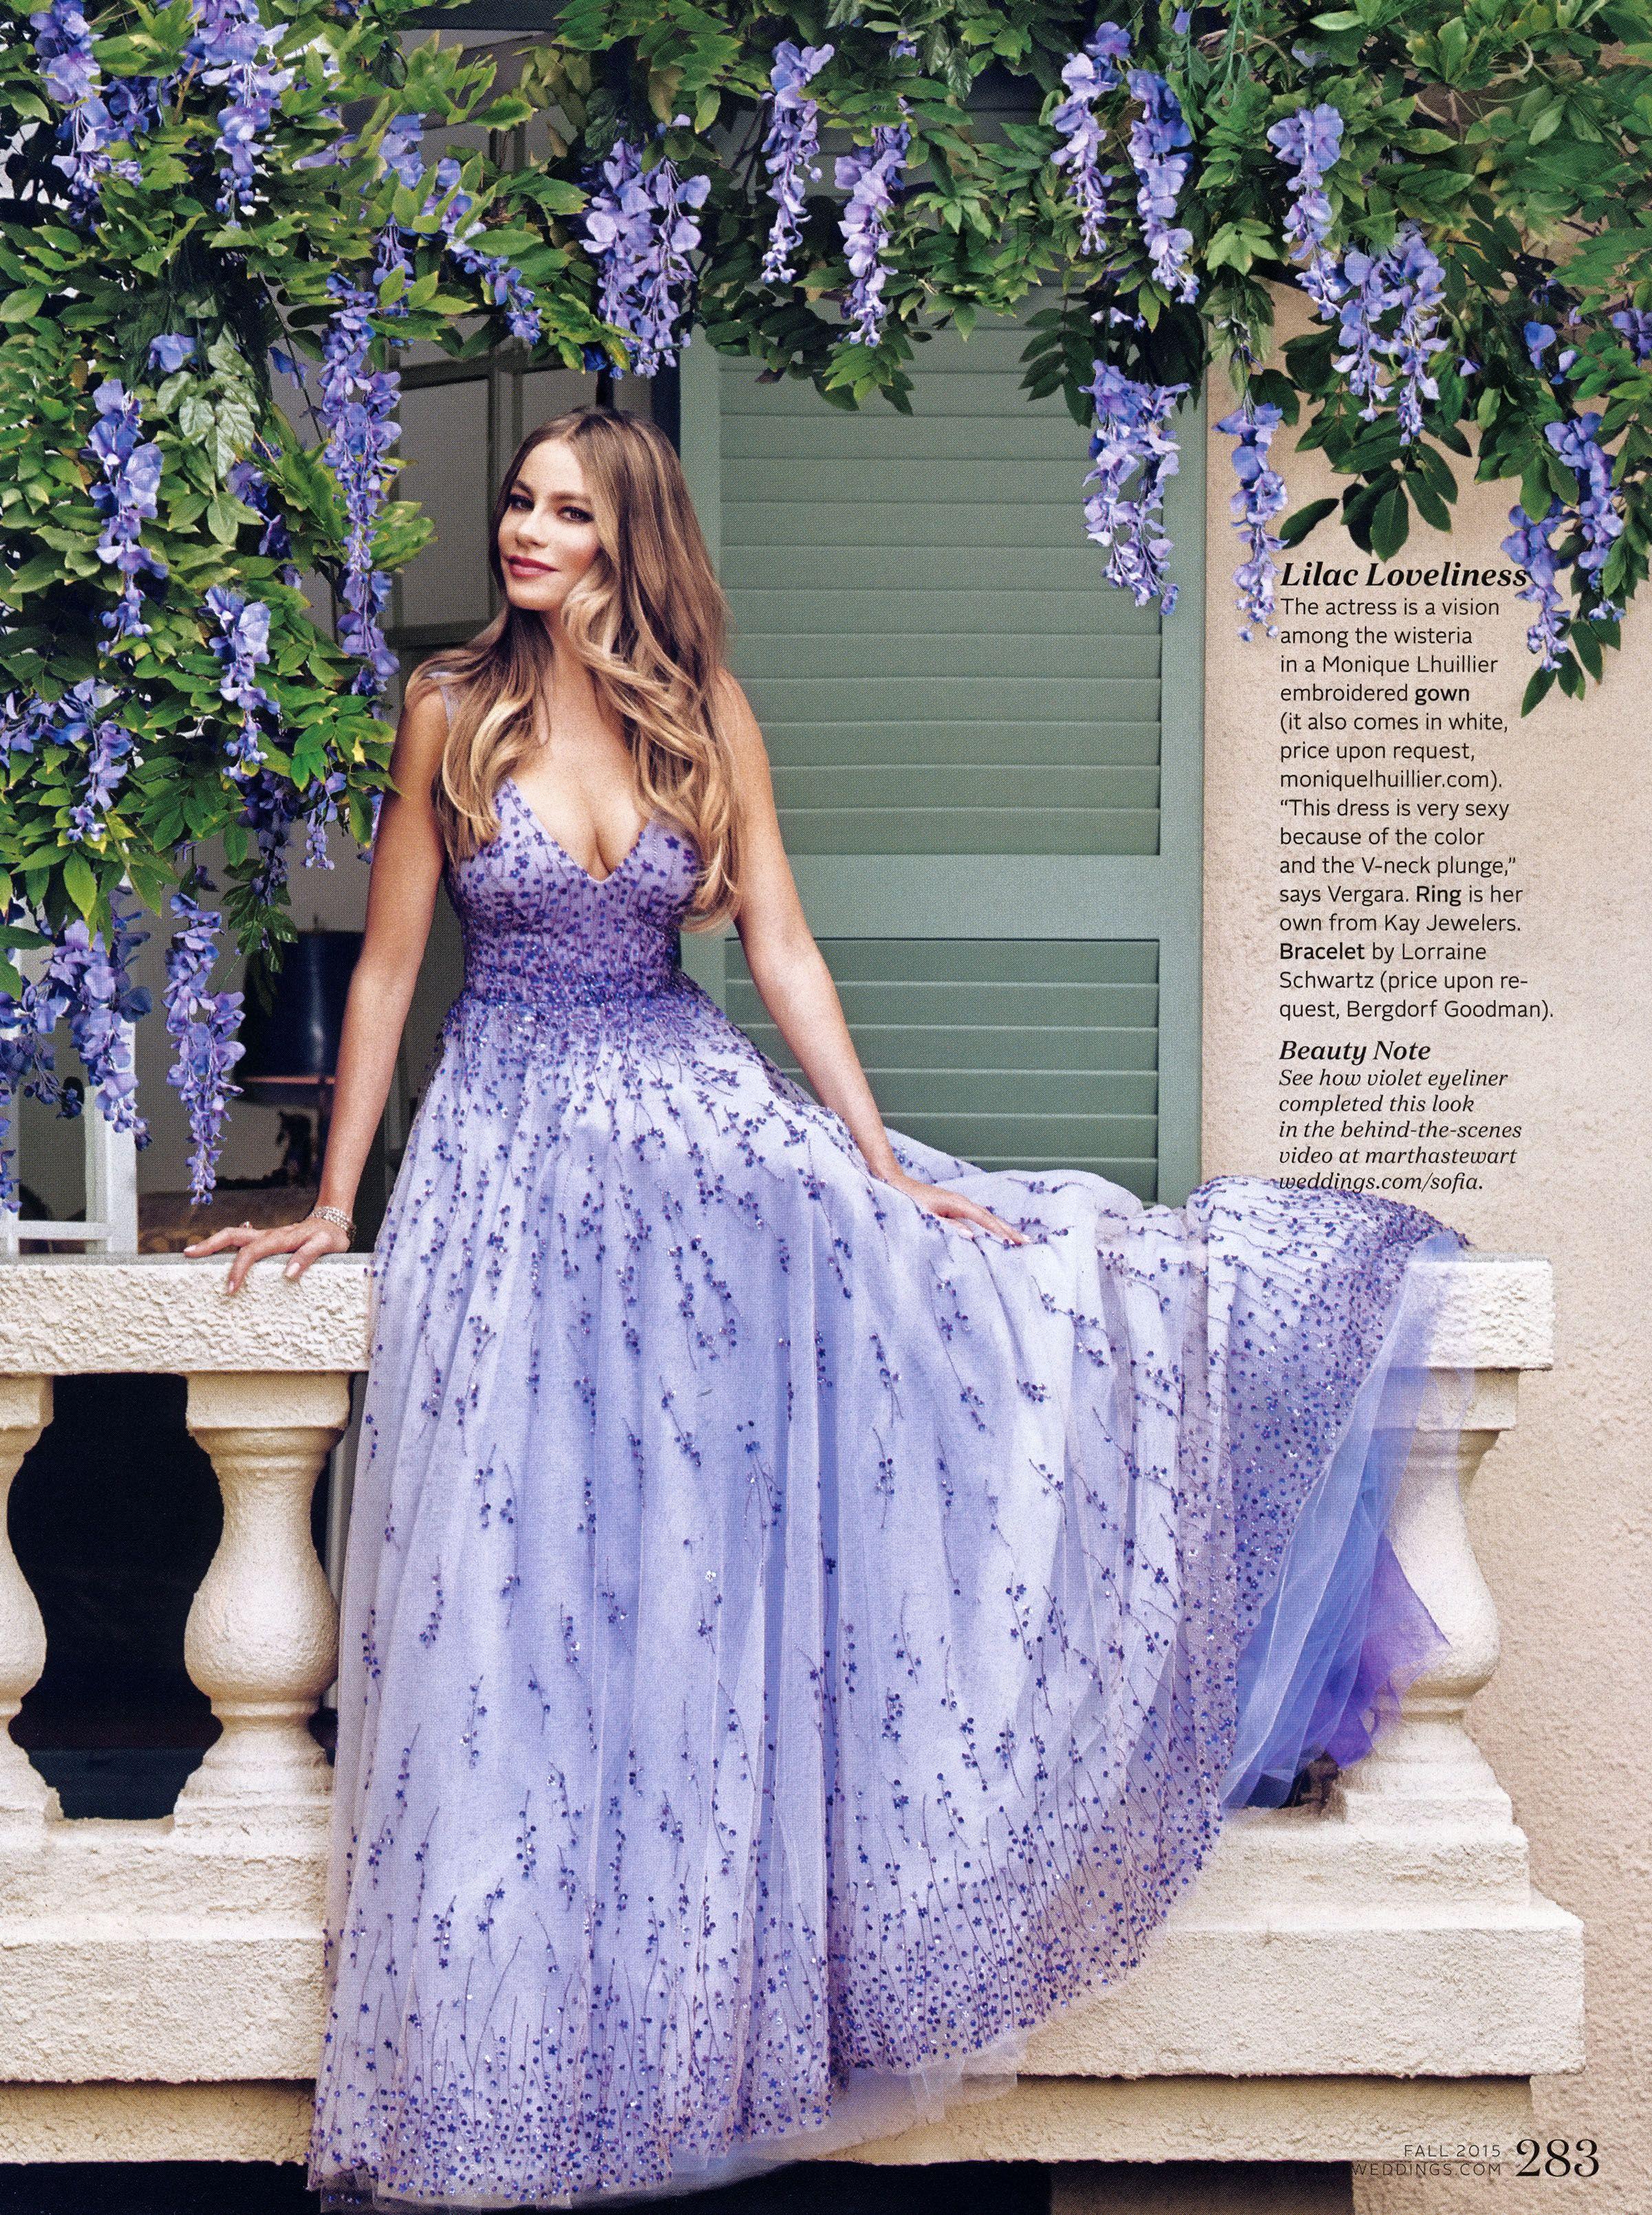 Sofia Vergara Martha Stewart Weddings Fall, 2015 | The Girl in the ...